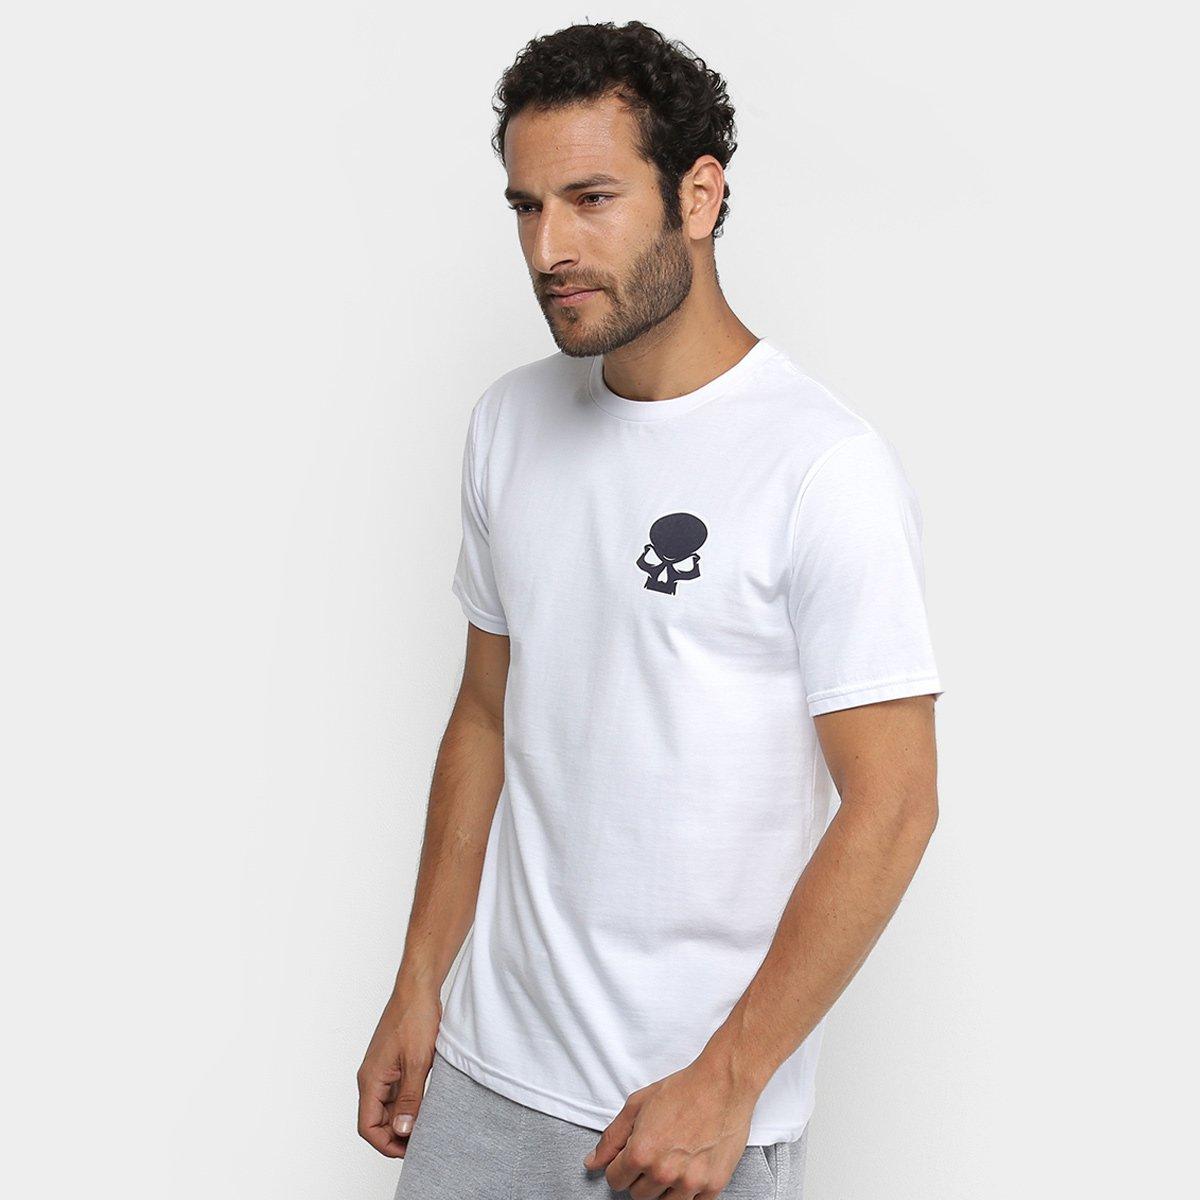 0f5f8f8b6d530 Camiseta Red Bull Skate Generation Skull Masculina - Branco - Compre Agora